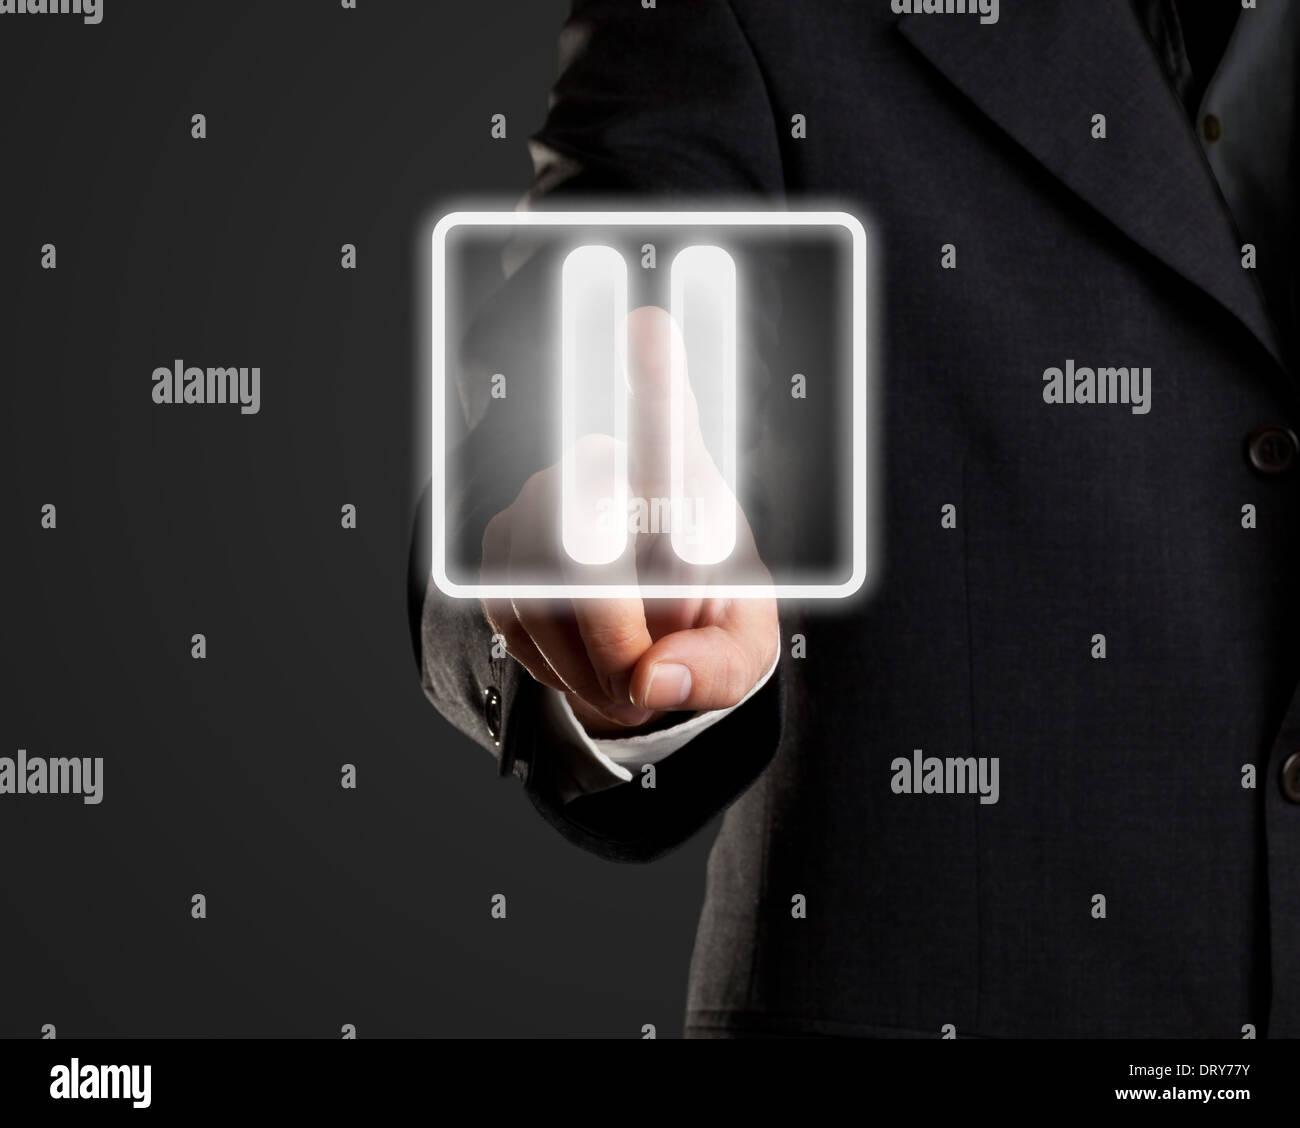 Empresario pulsando botón de pausa en la pantalla virtual Imagen De Stock